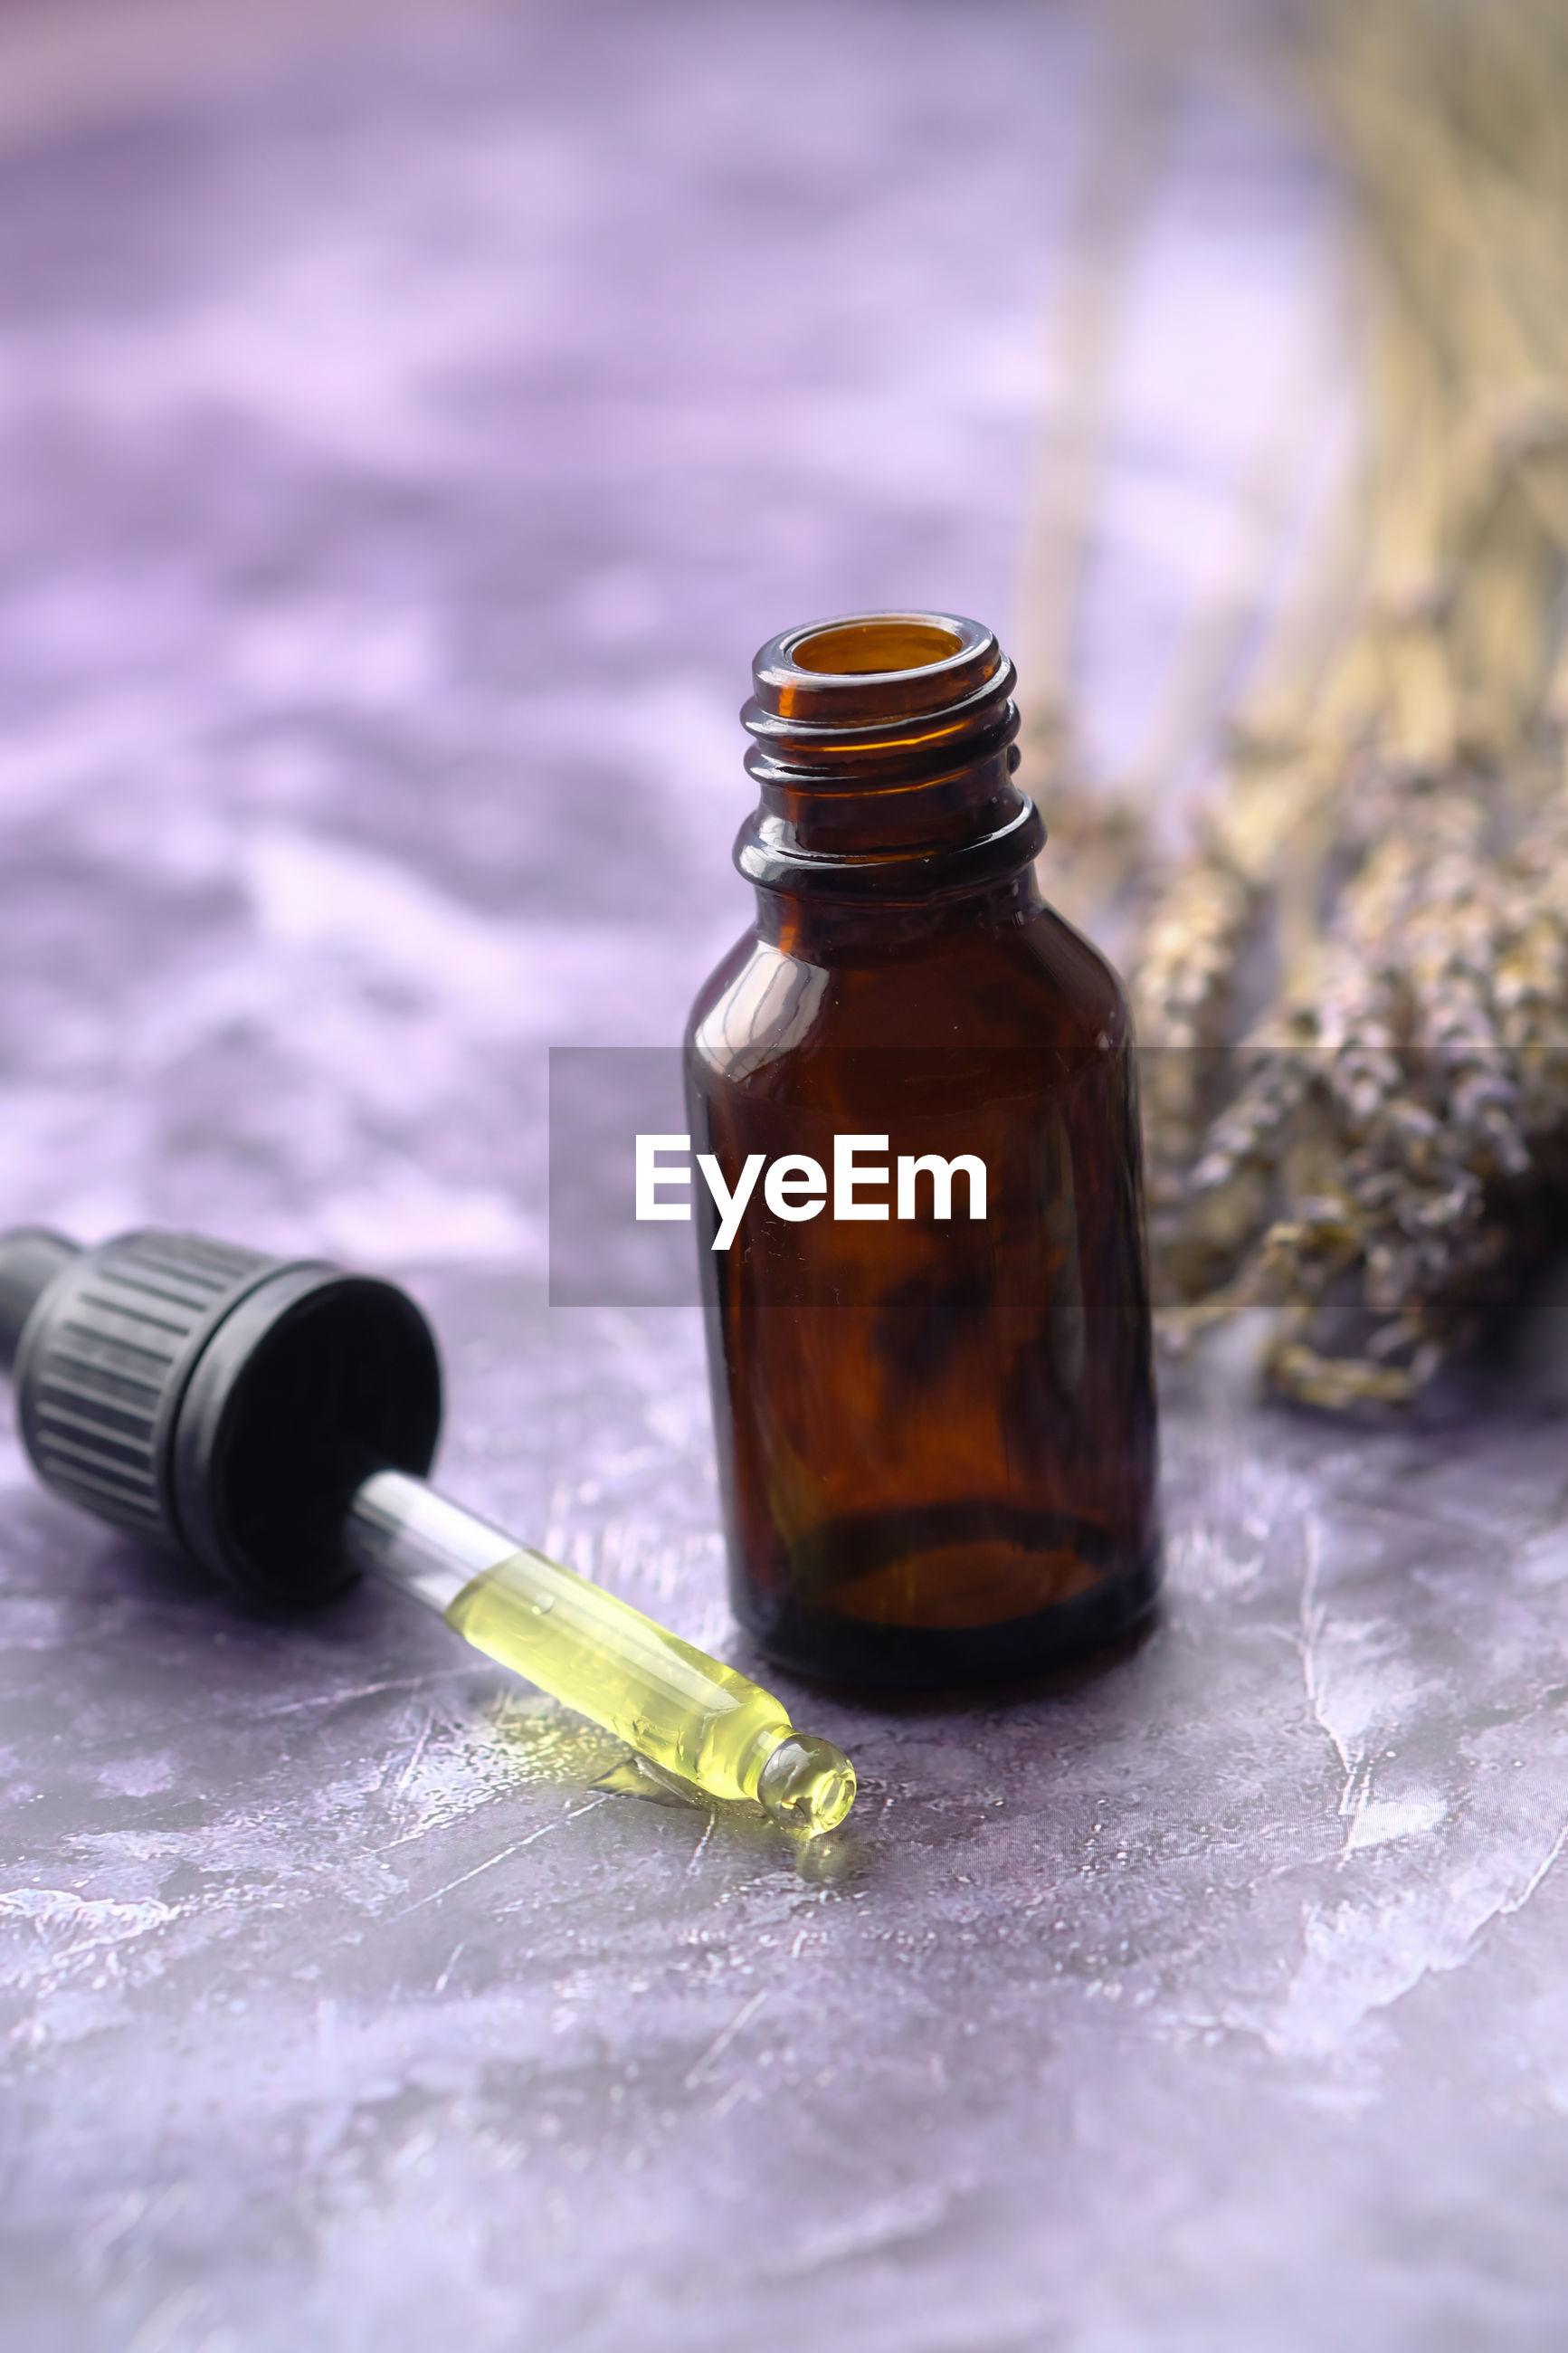 Alternative medicine herbal medicine on table, close up.